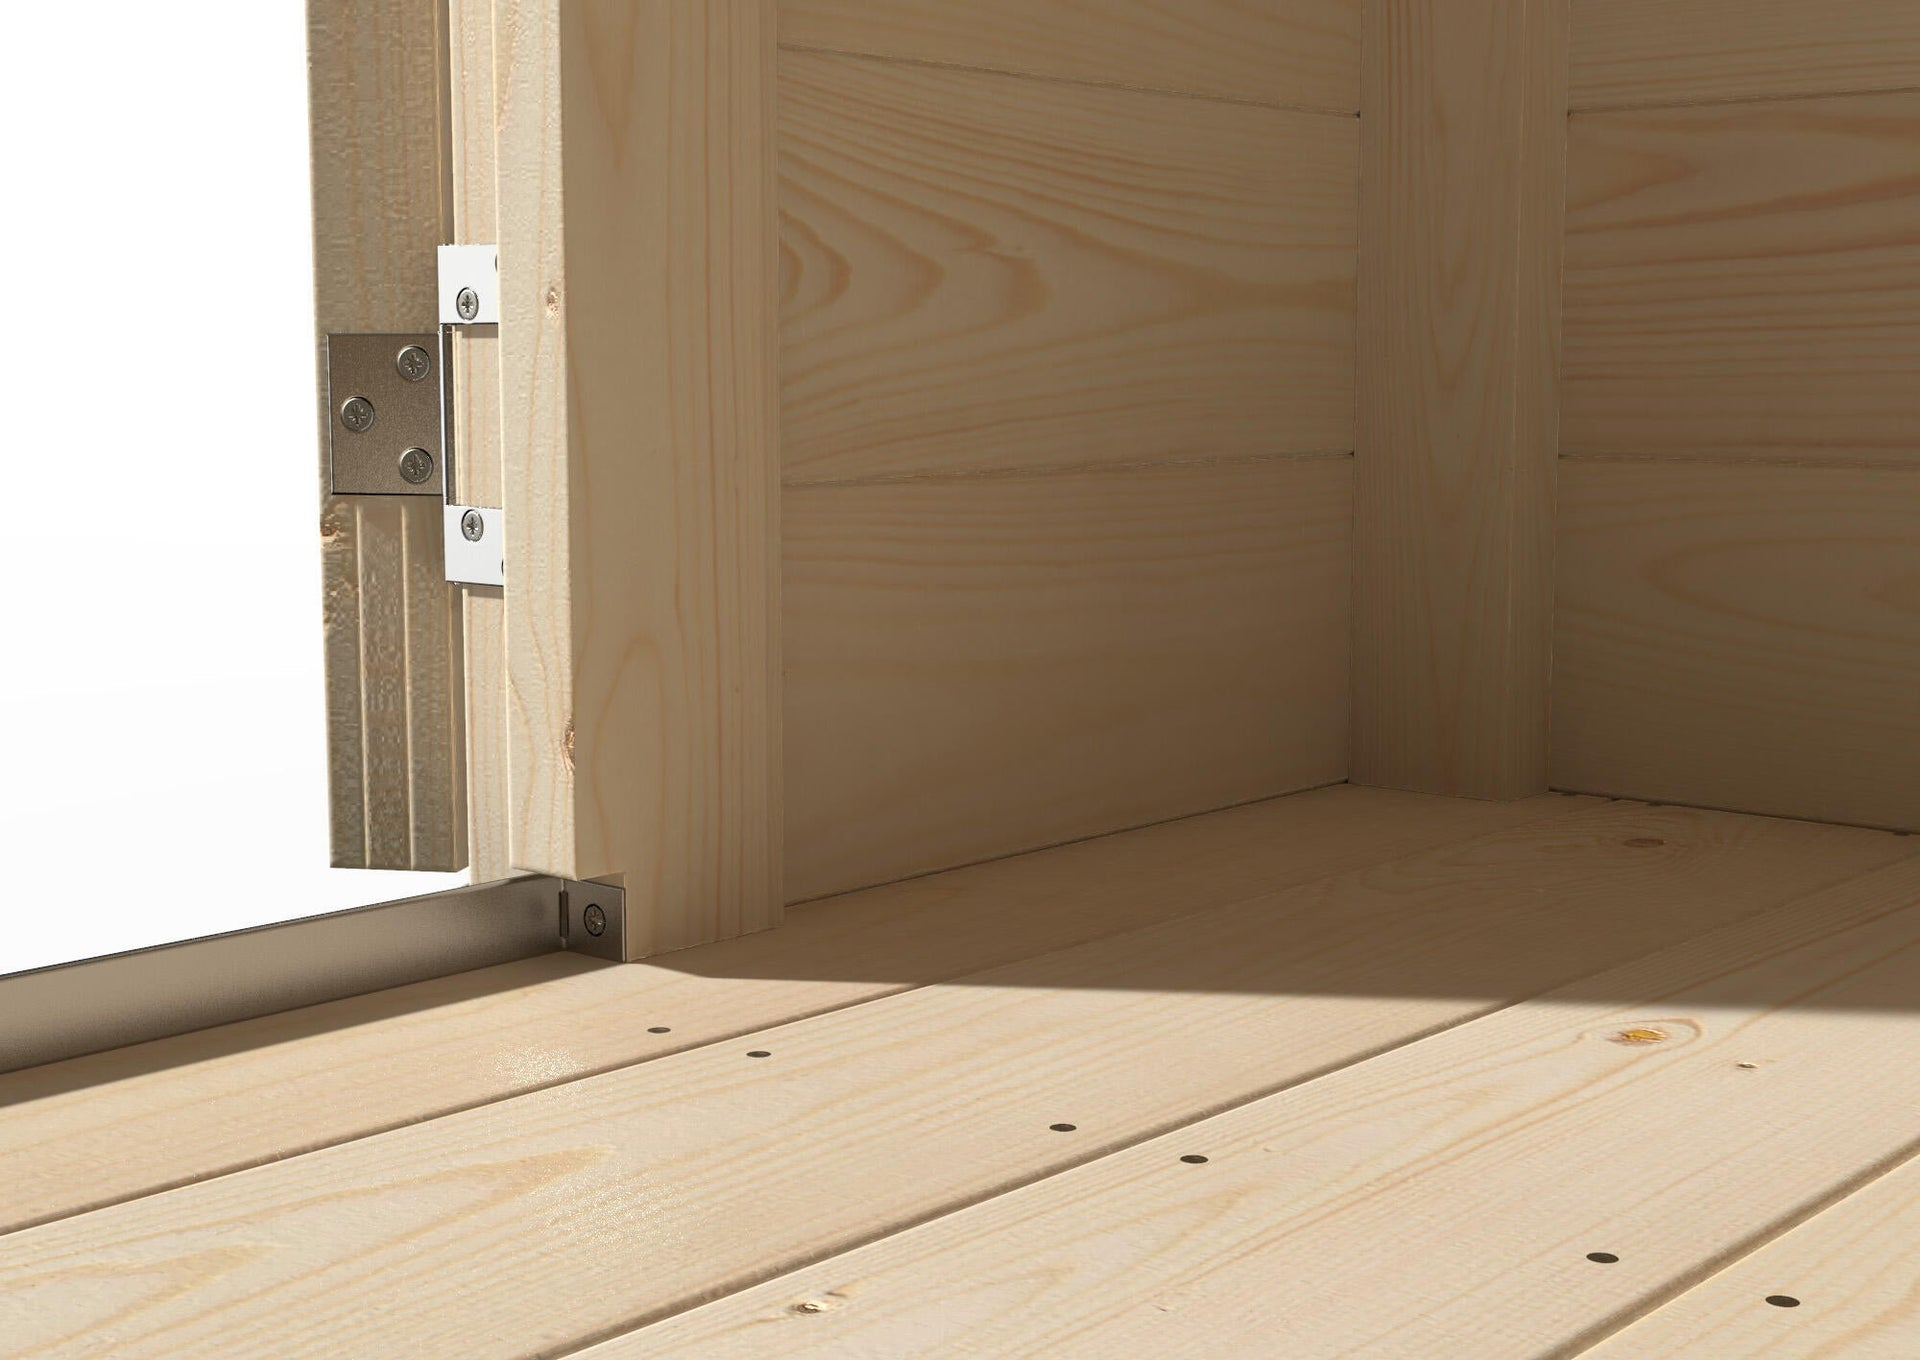 Pavimento per casetta da giardino Azalea DECOR ET JARDIN 332.4 x 300 x 45 cm - 2